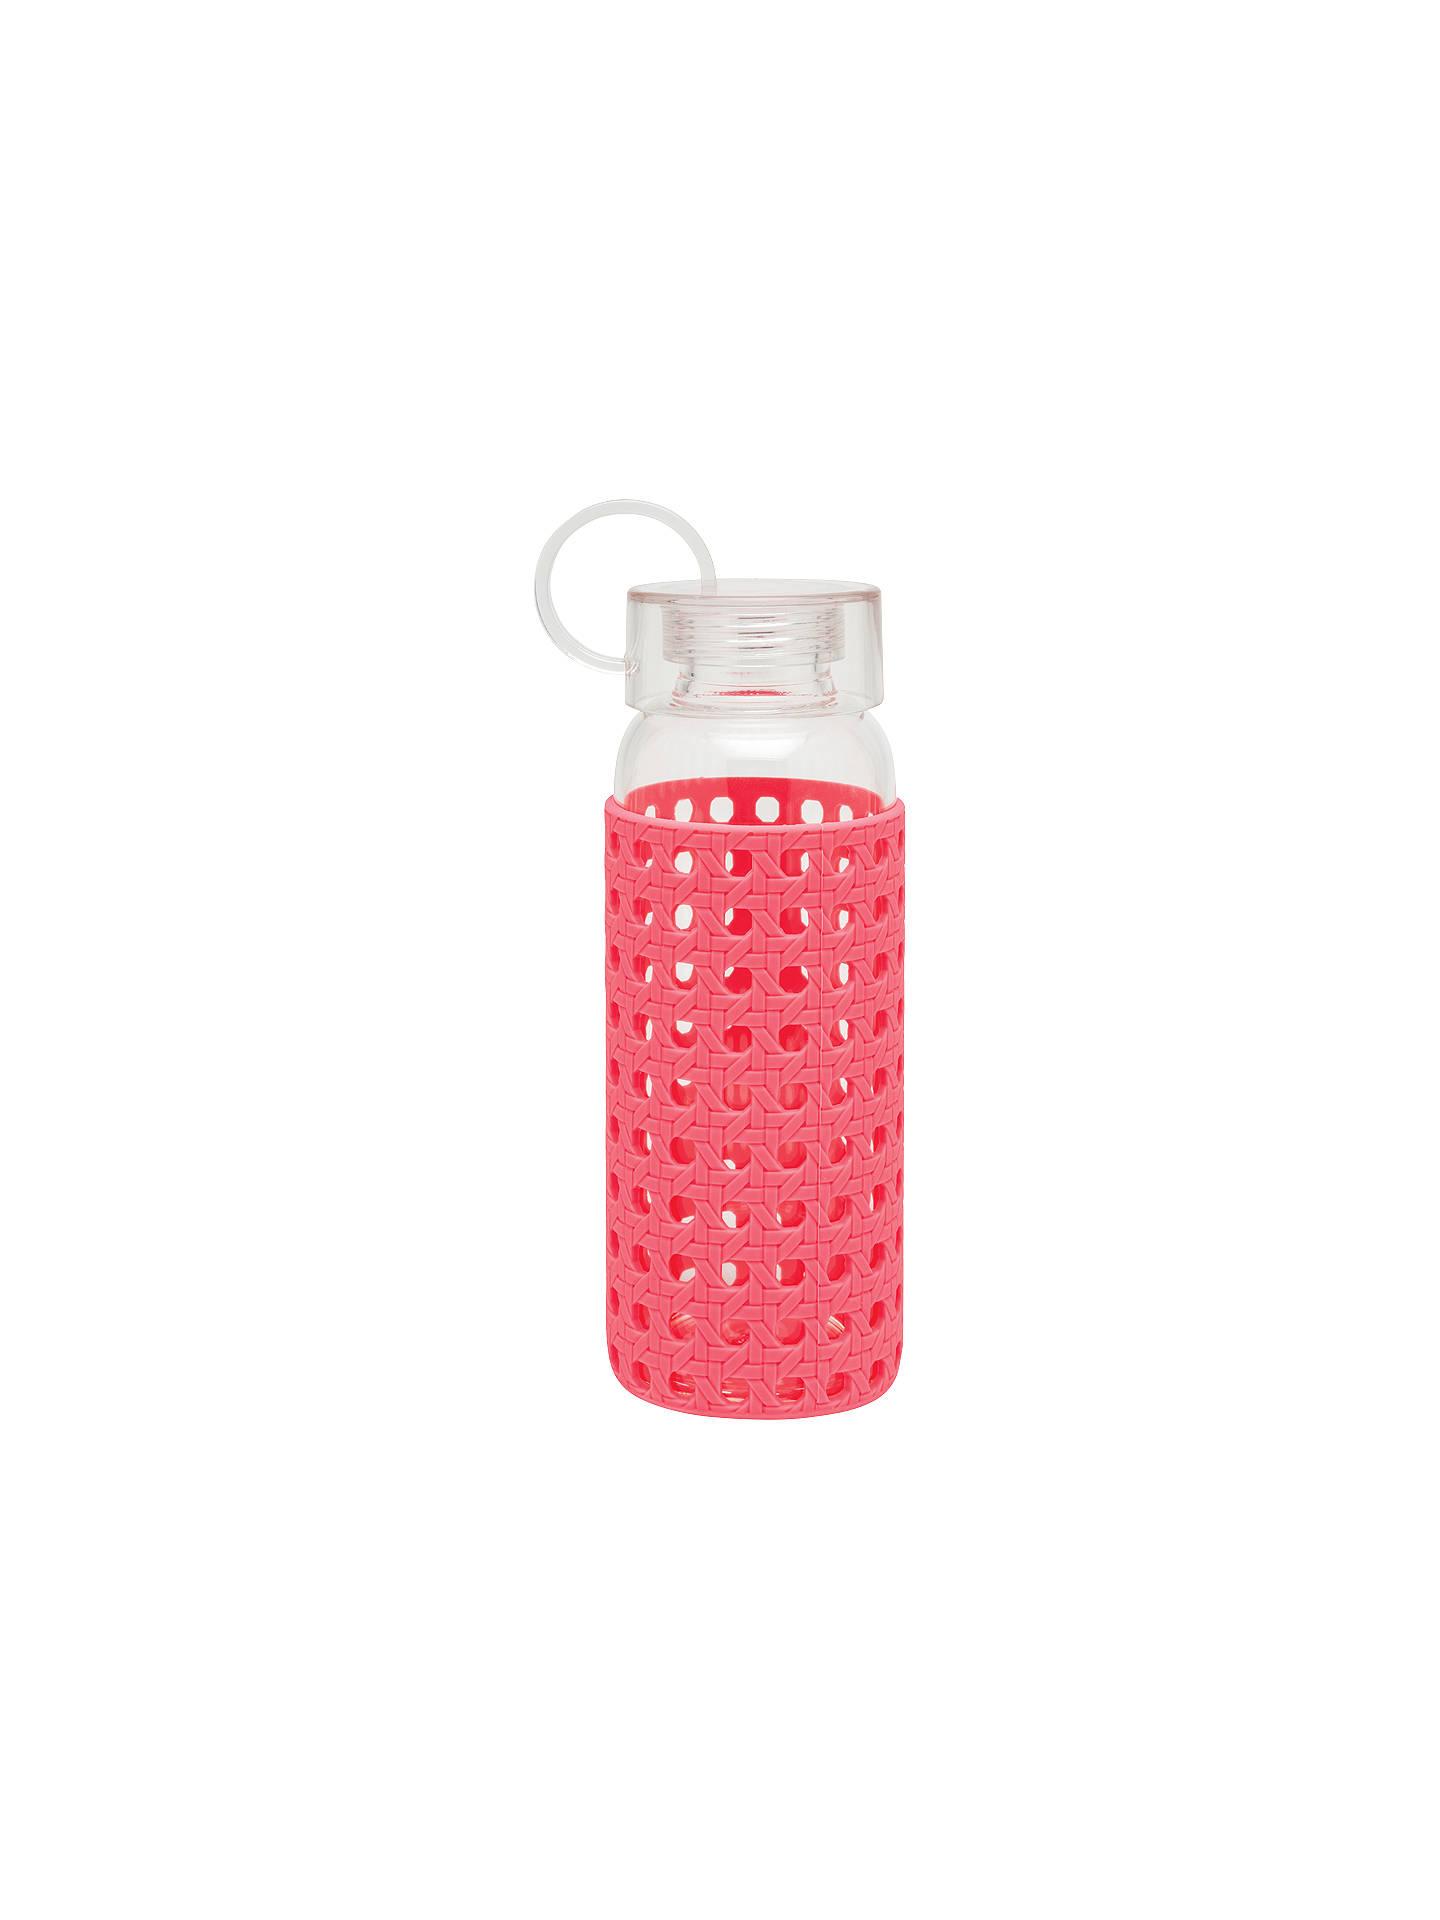 kate spade new york Glass Water Bottle, Pink